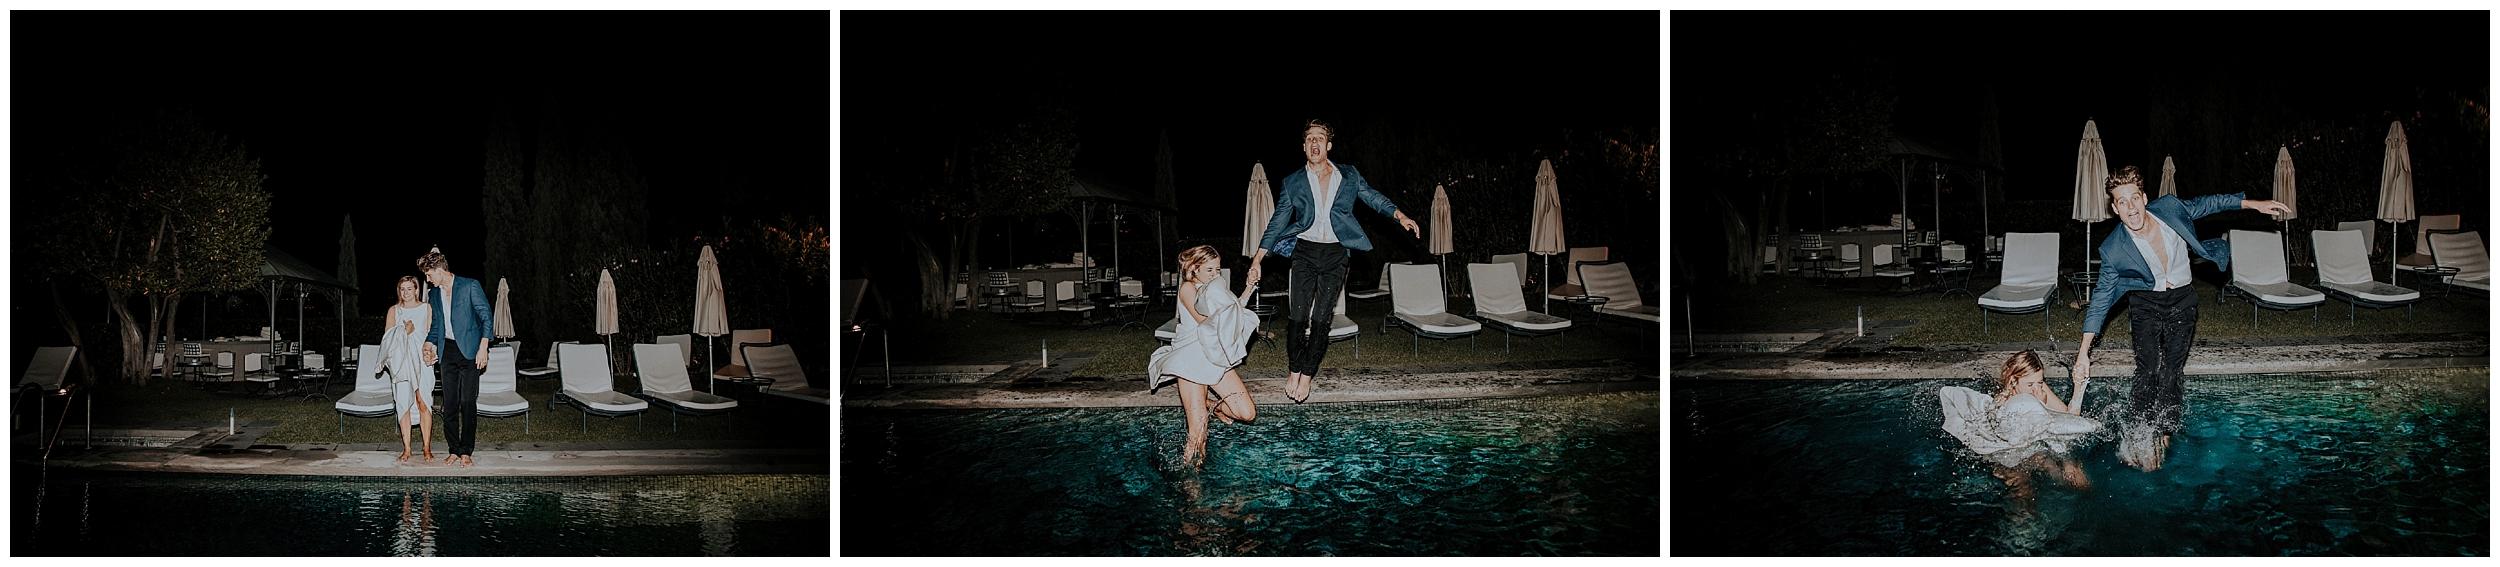 destination-austin-wedding-photographer-italy-florence597.JPG